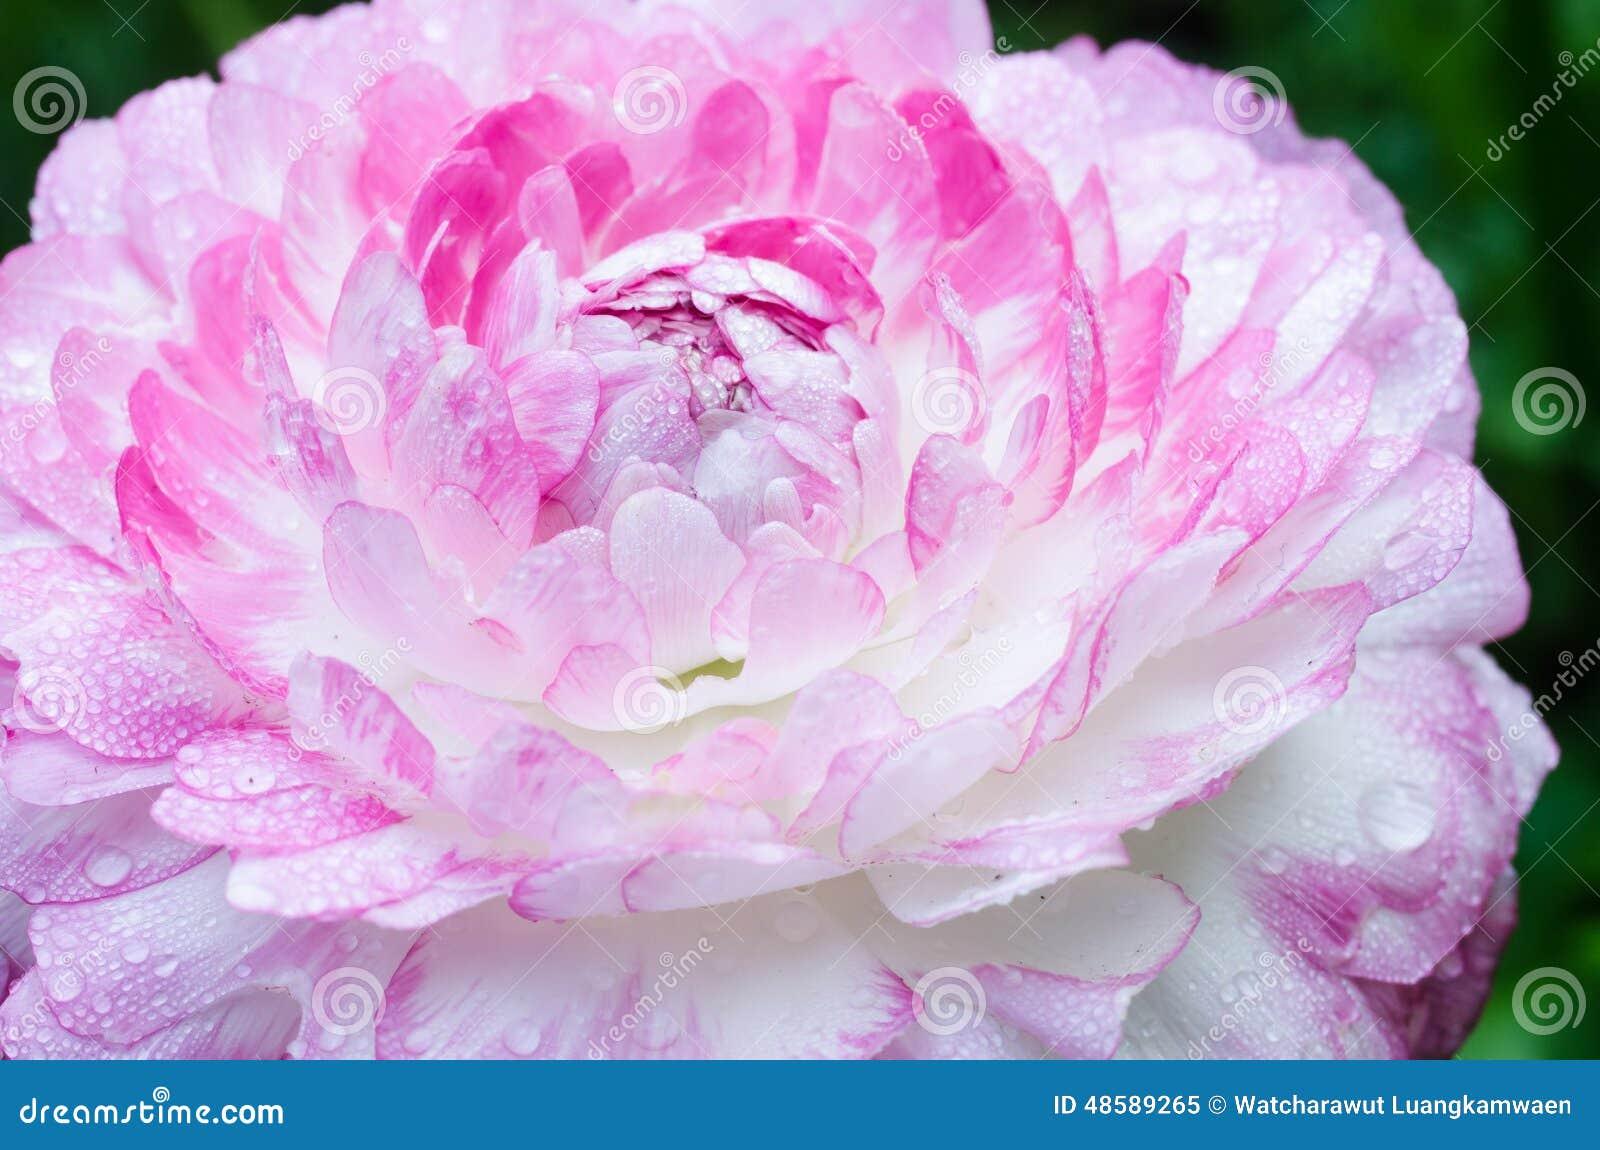 Single Flower Garden : Pink flower in the garden stock photo image